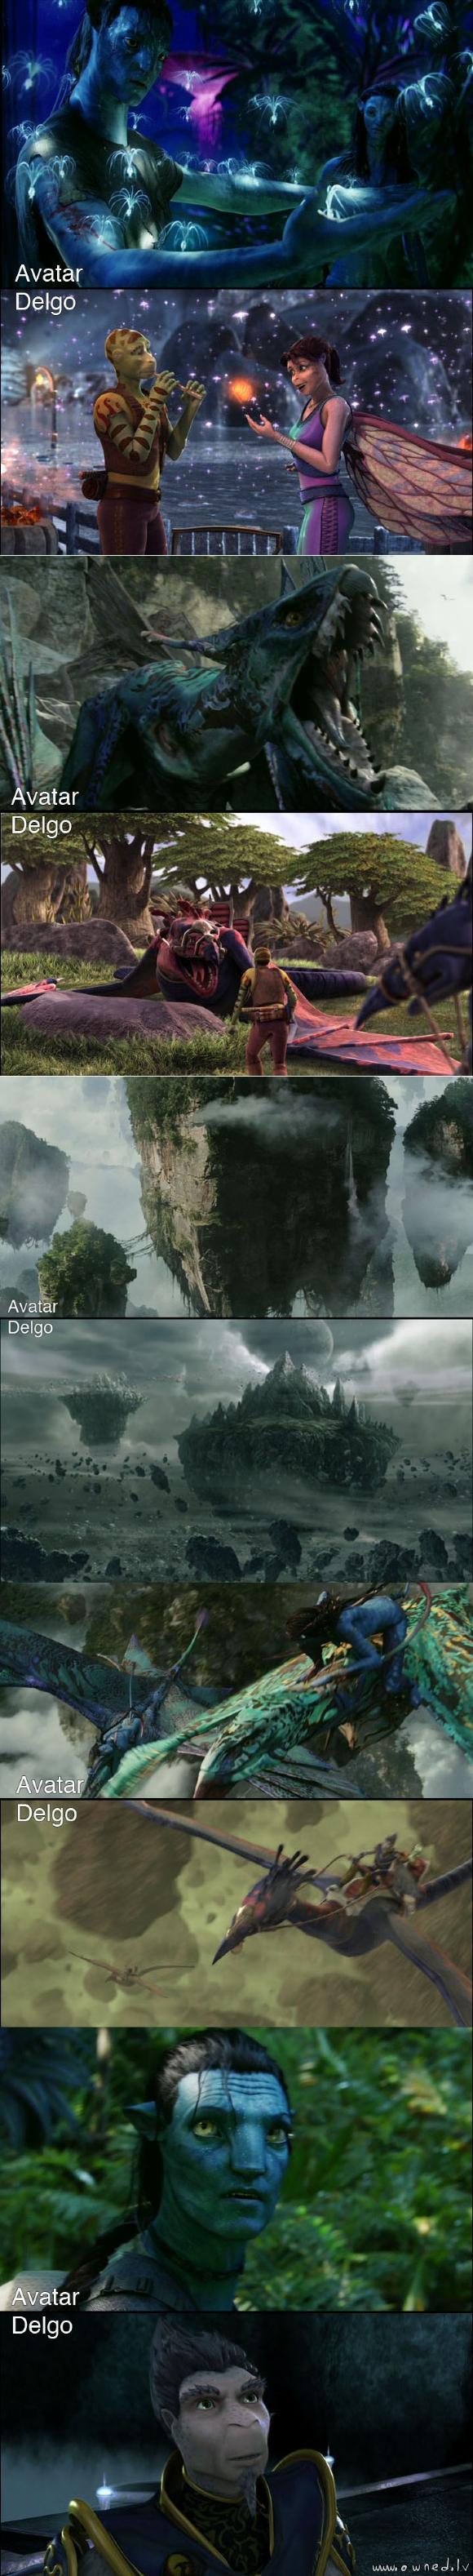 Avatar vs Delgo